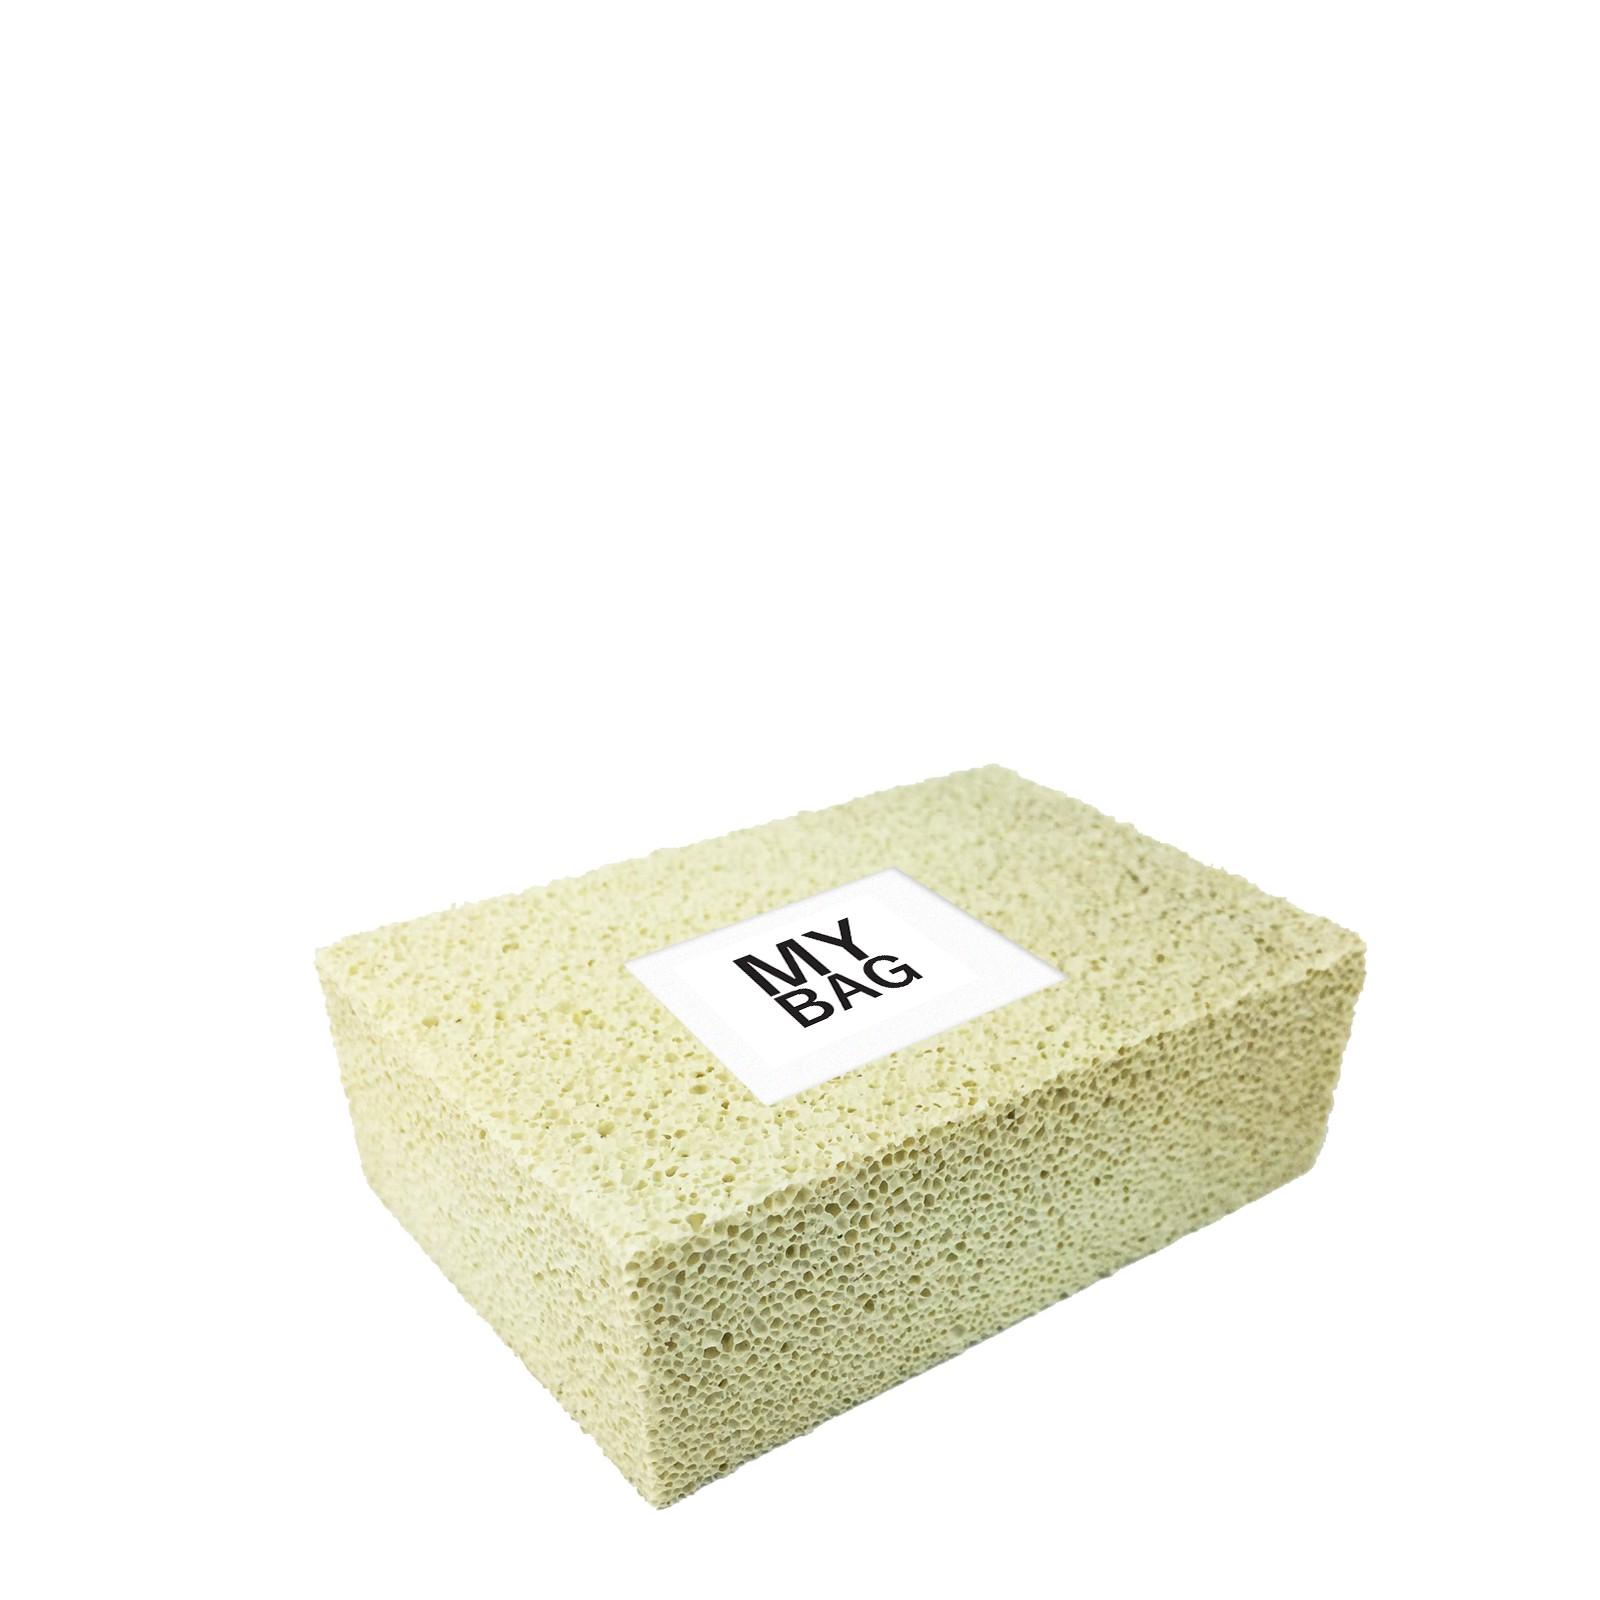 My Bag Suede Dust Catcheer Cleaning Sponge